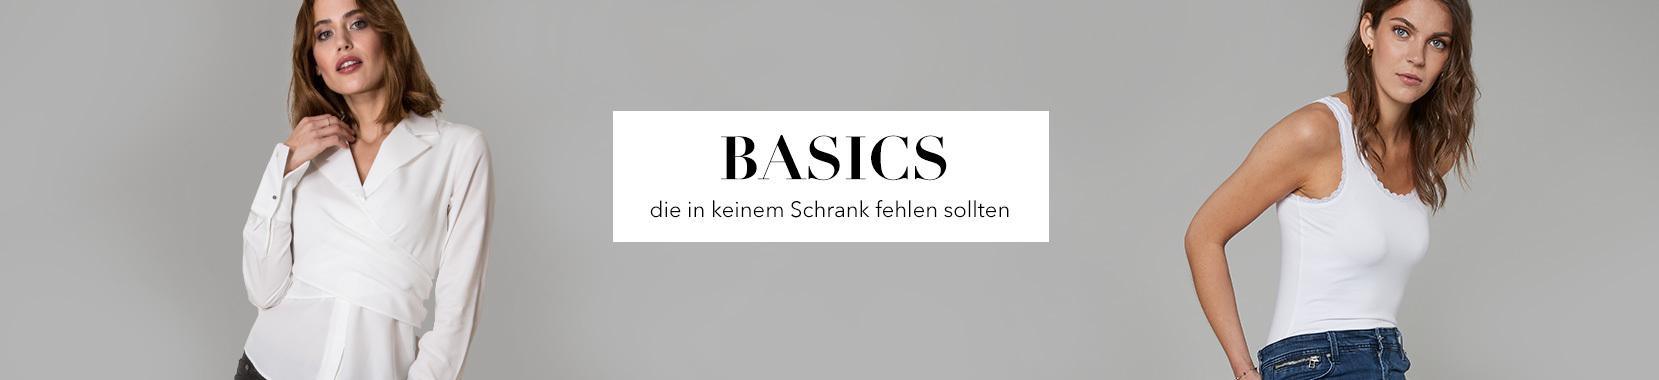 2021-02-Basics-1659x380-Damen-Banner-desktop